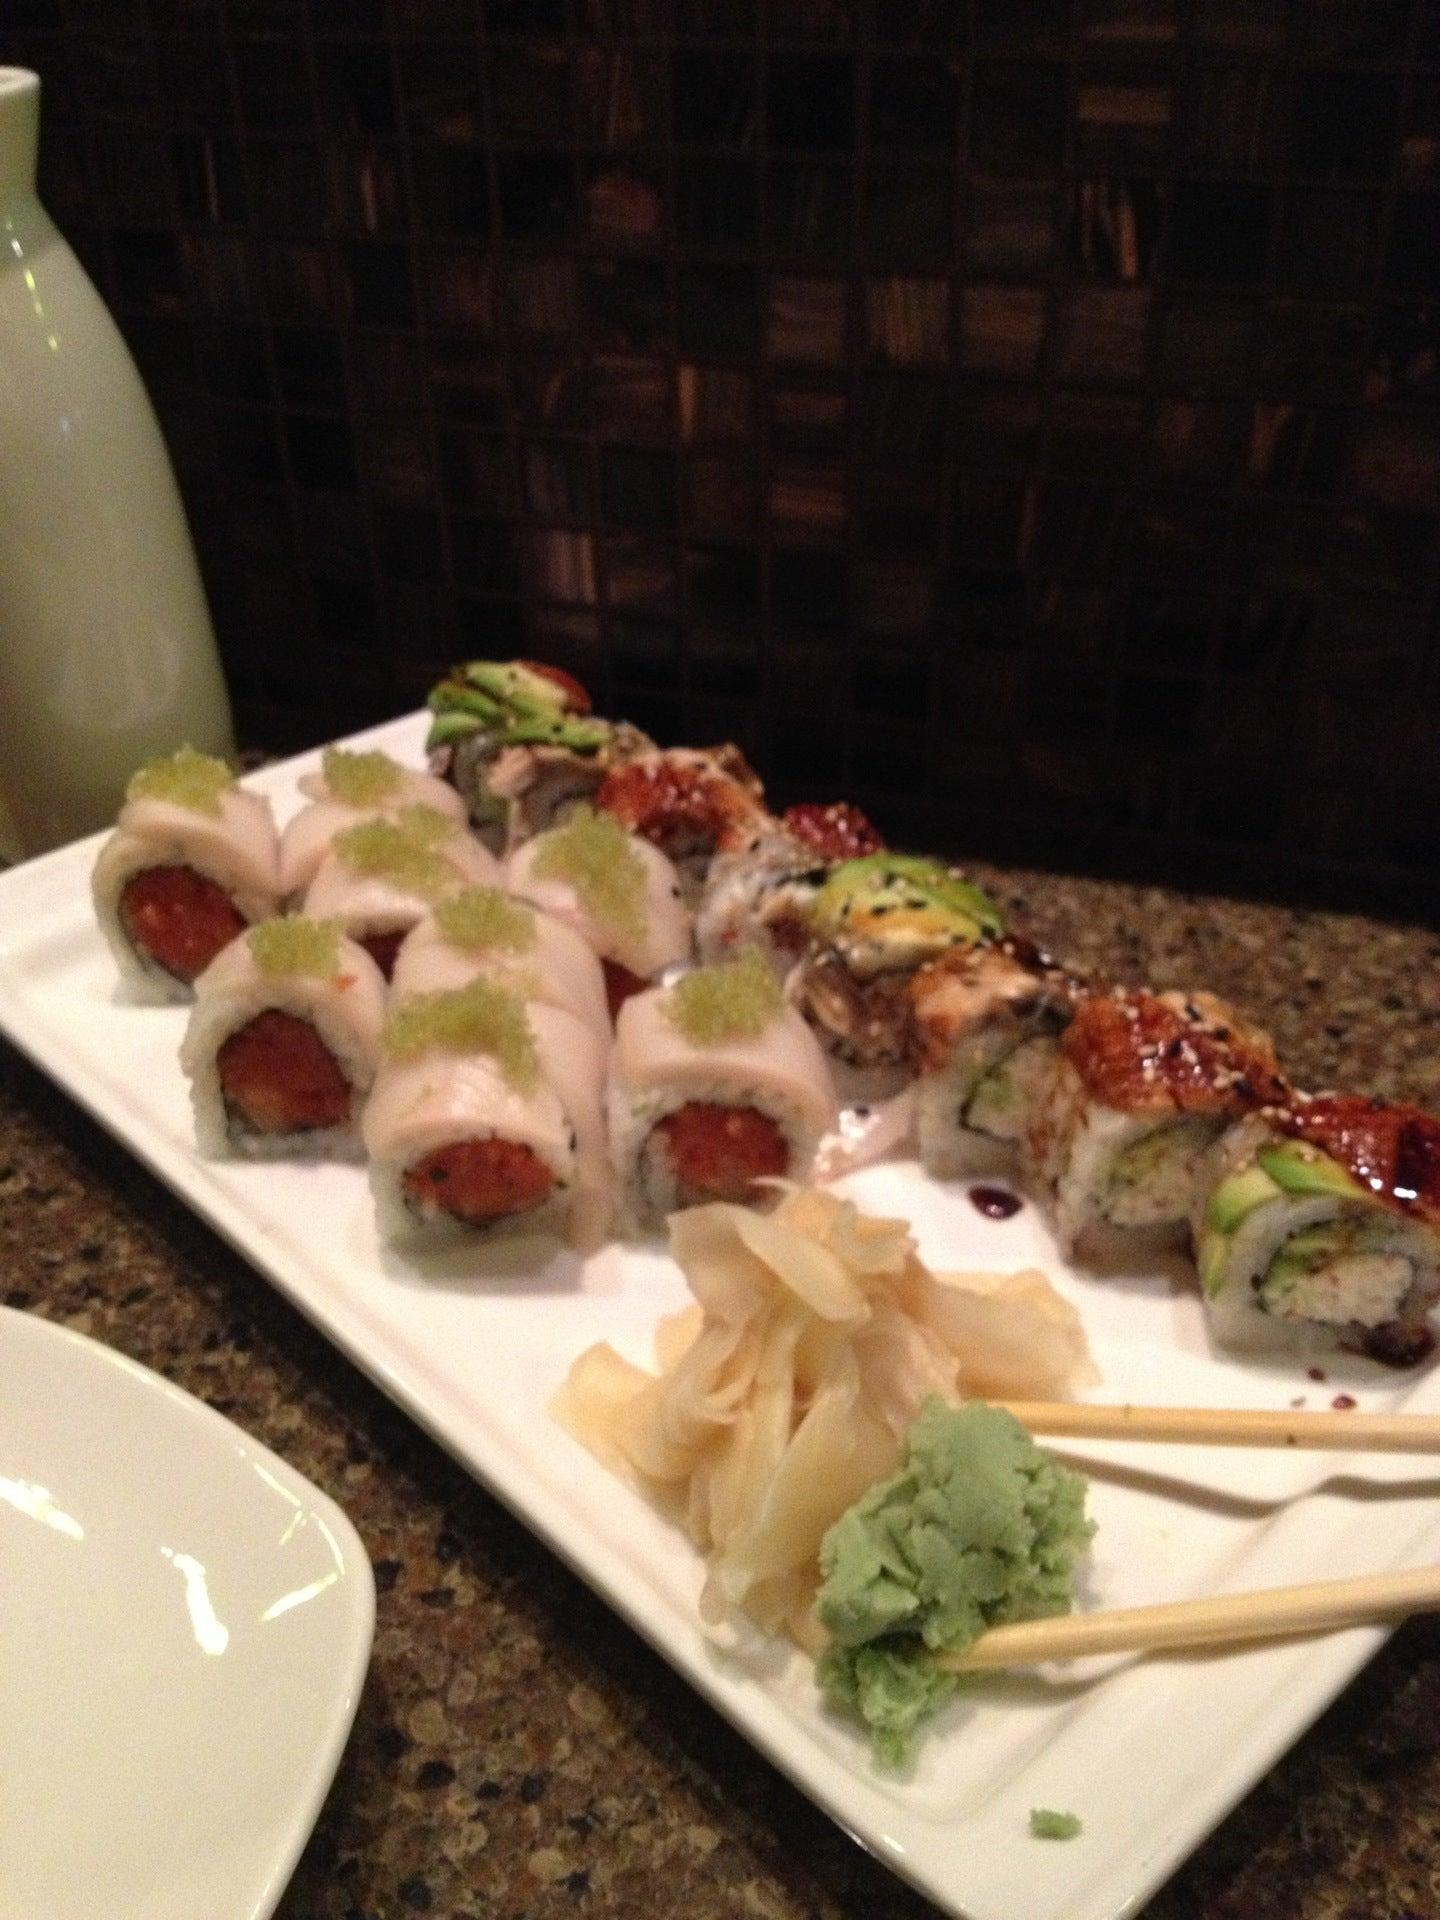 Nagoya Japanese Steakhouse & Sushi at 6190 Levis mons Blvd